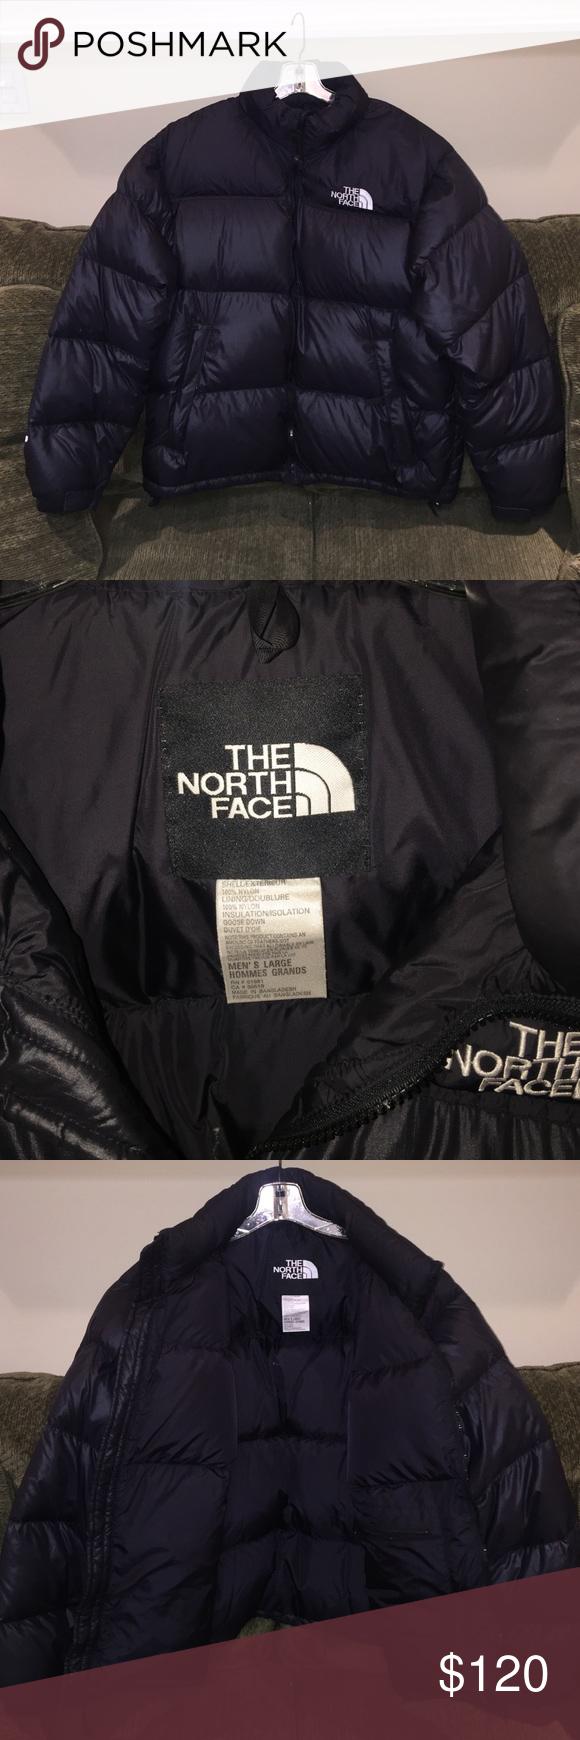 North Face Men S Goose Down Jacket North Face Mens Down Jacket Jackets [ 1740 x 580 Pixel ]